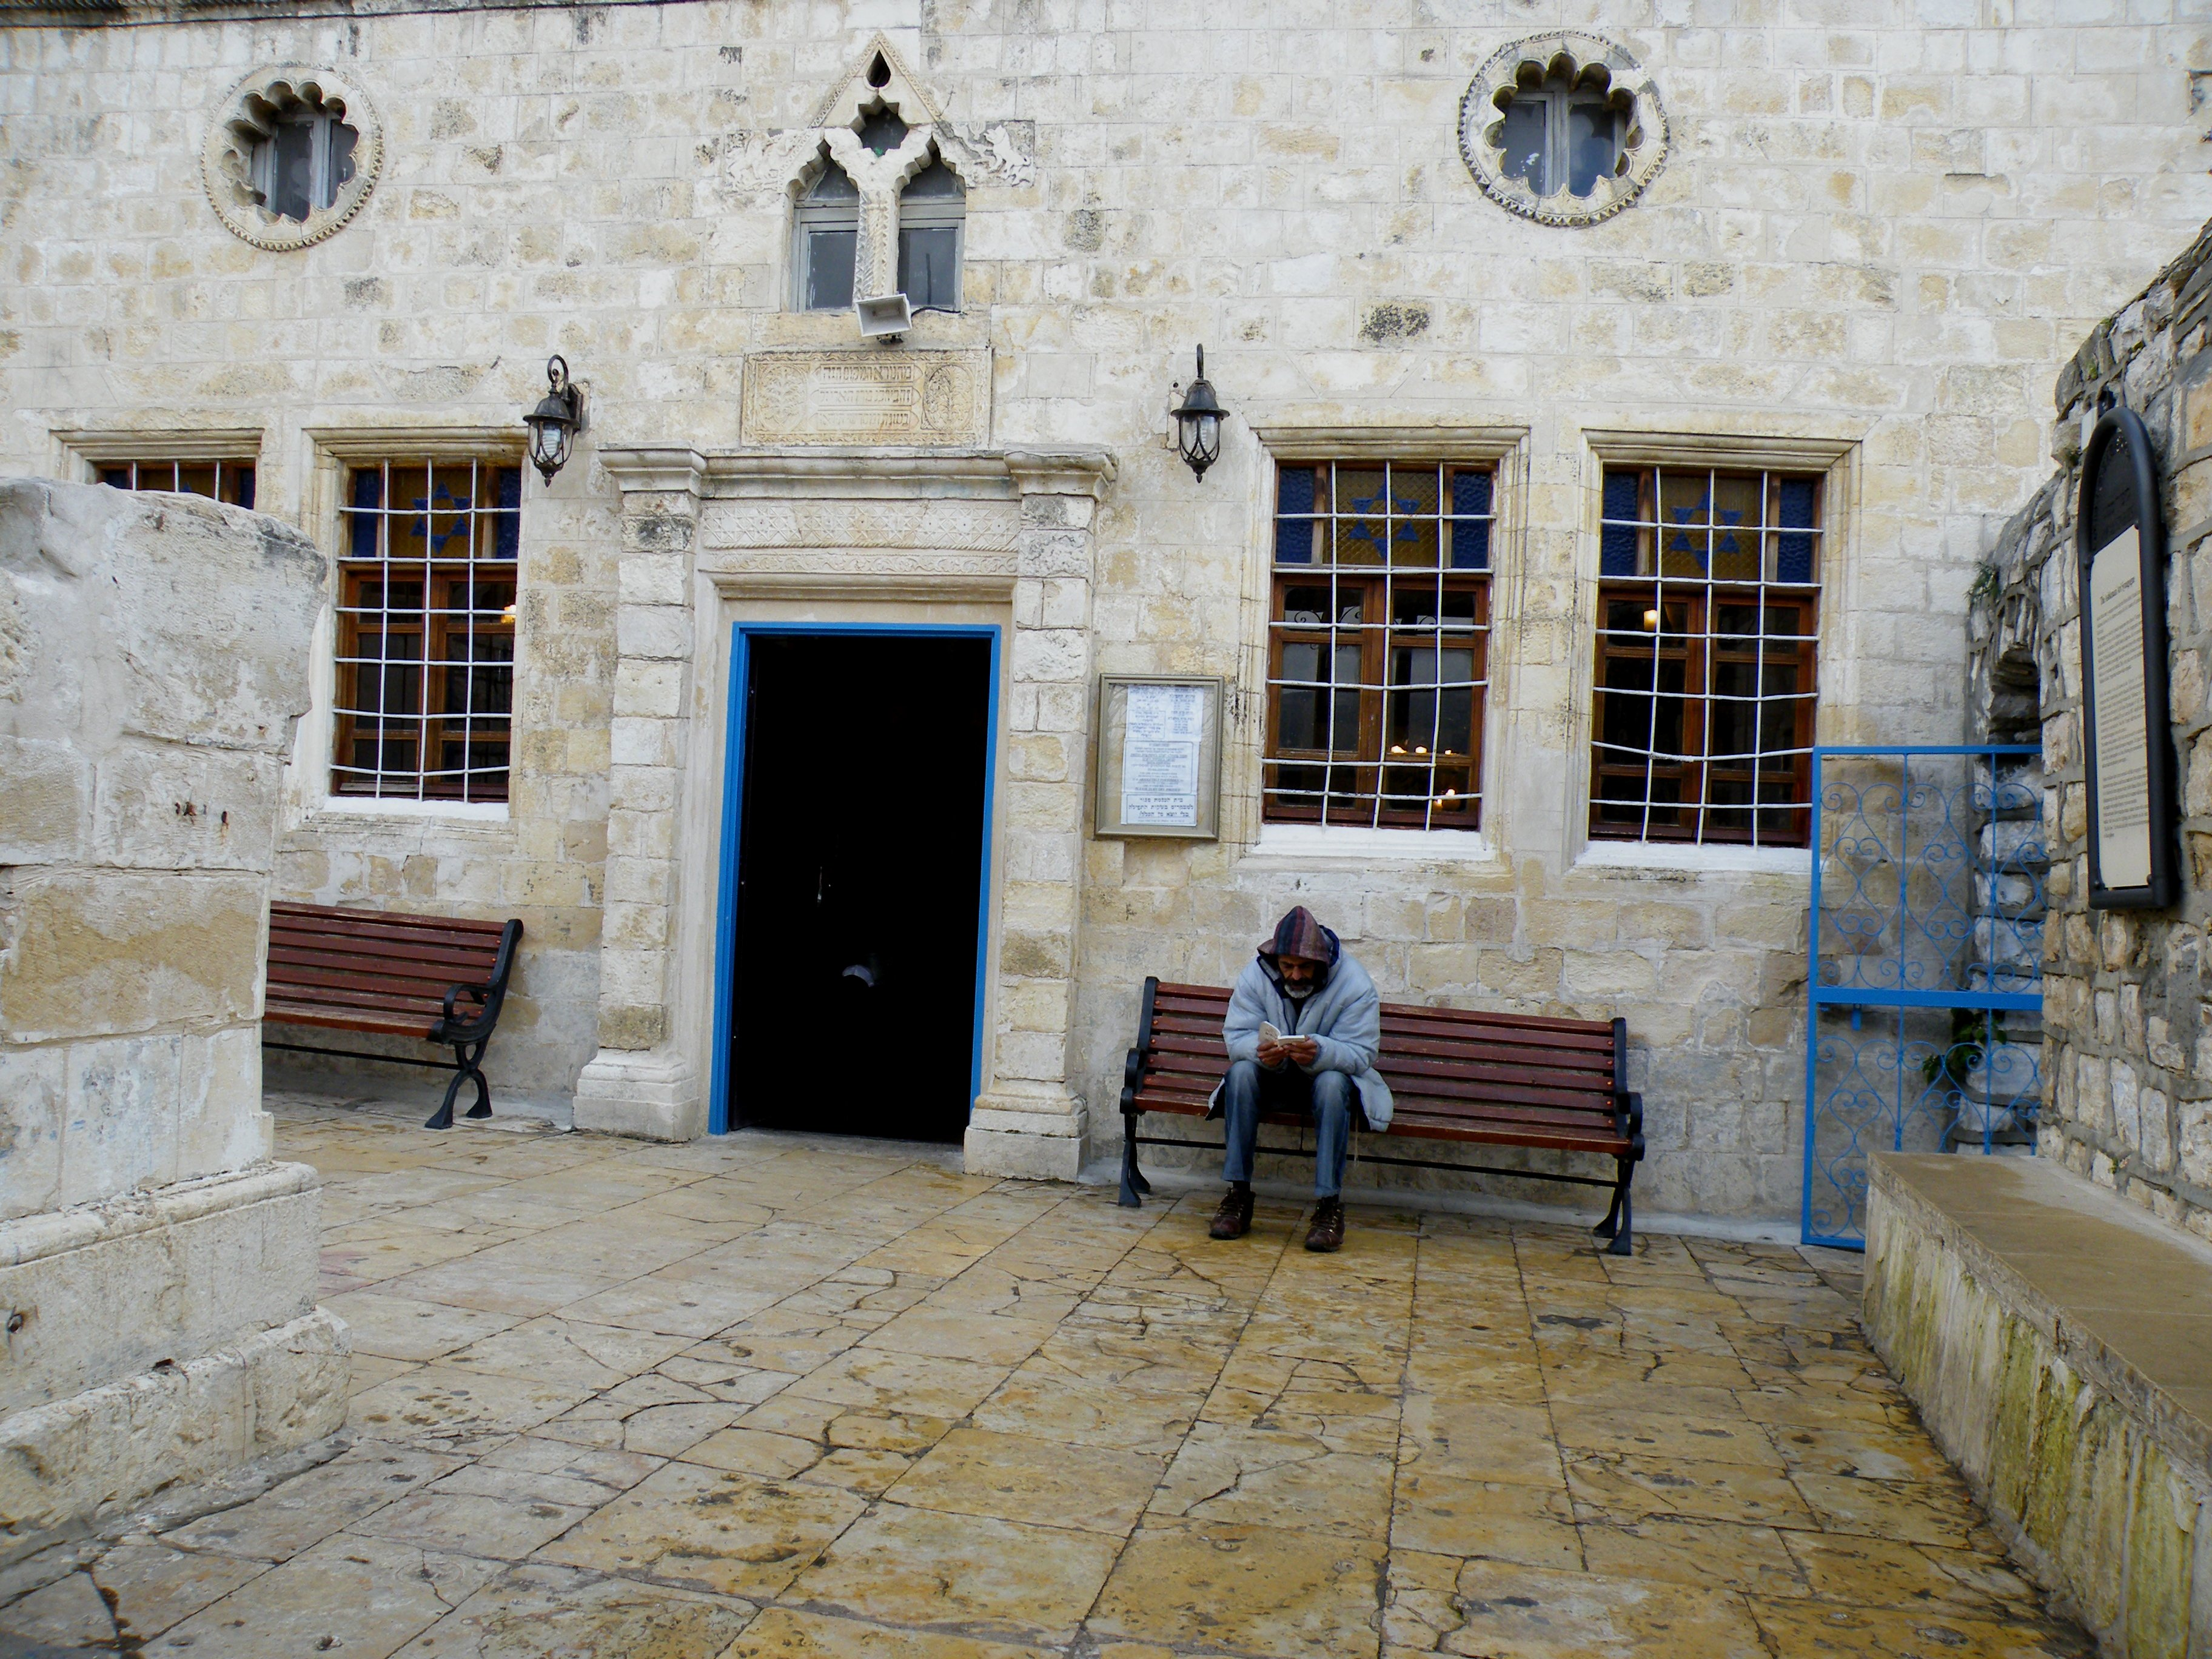 File:Ari Ashkenazi Synagogue, exterior.jpg - Wikipedia